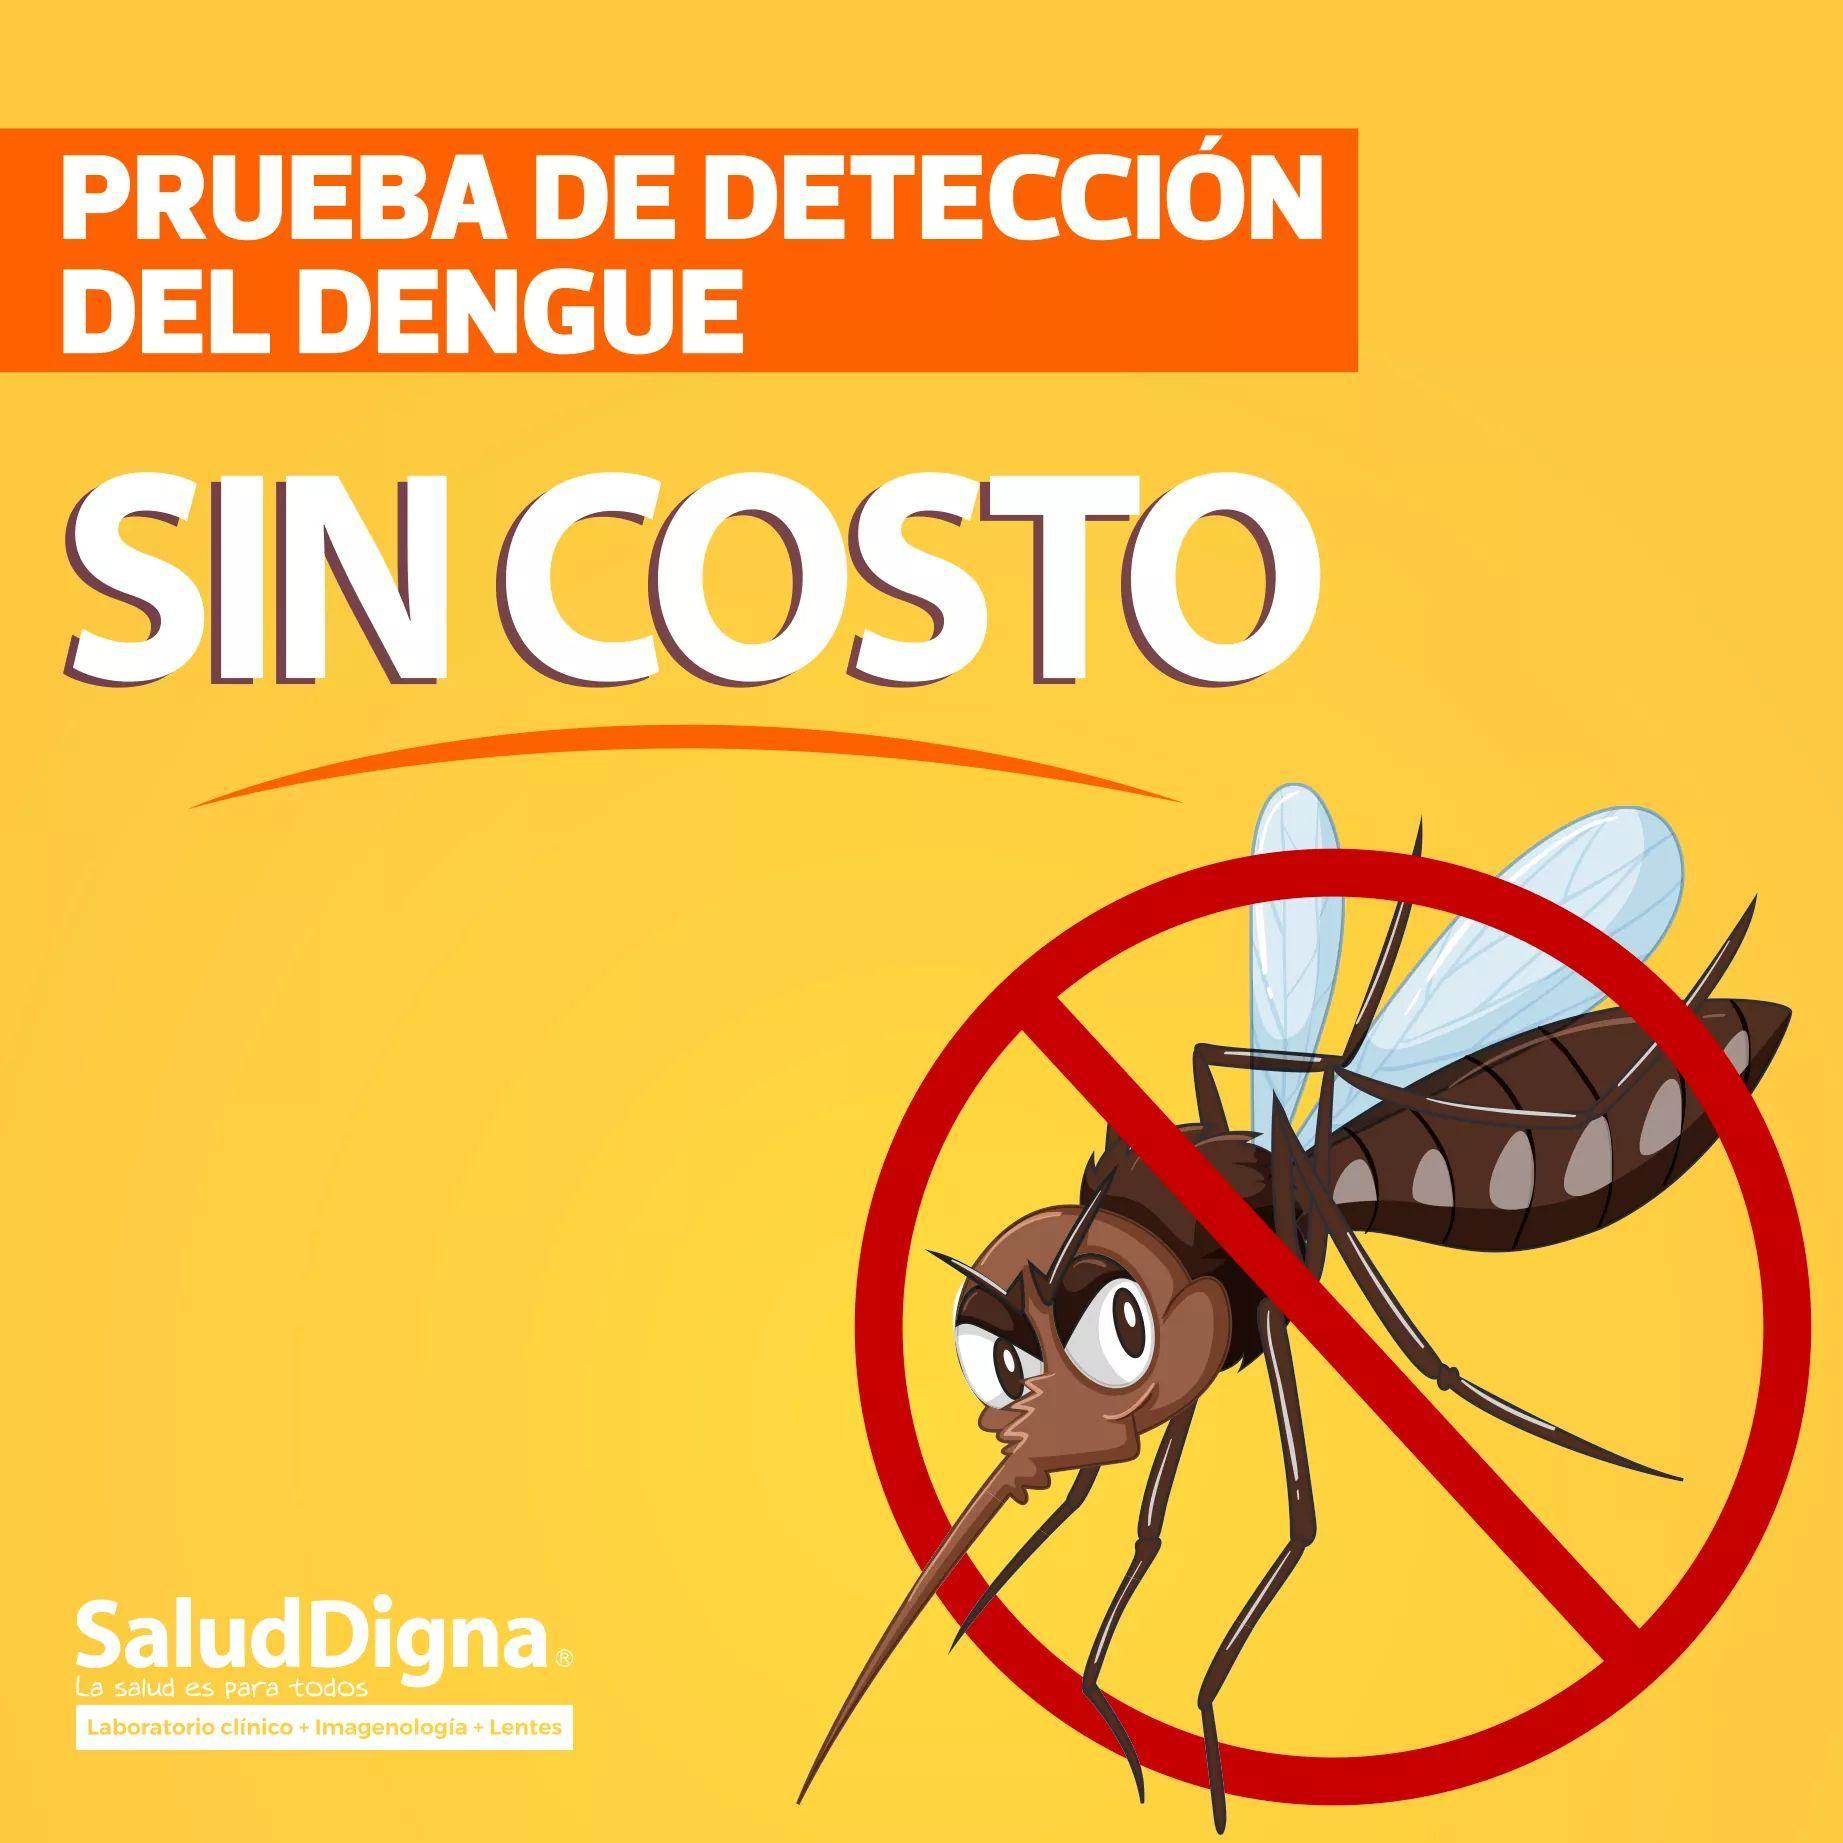 Salud Digna Jalisco: Prueba del dengue gratis